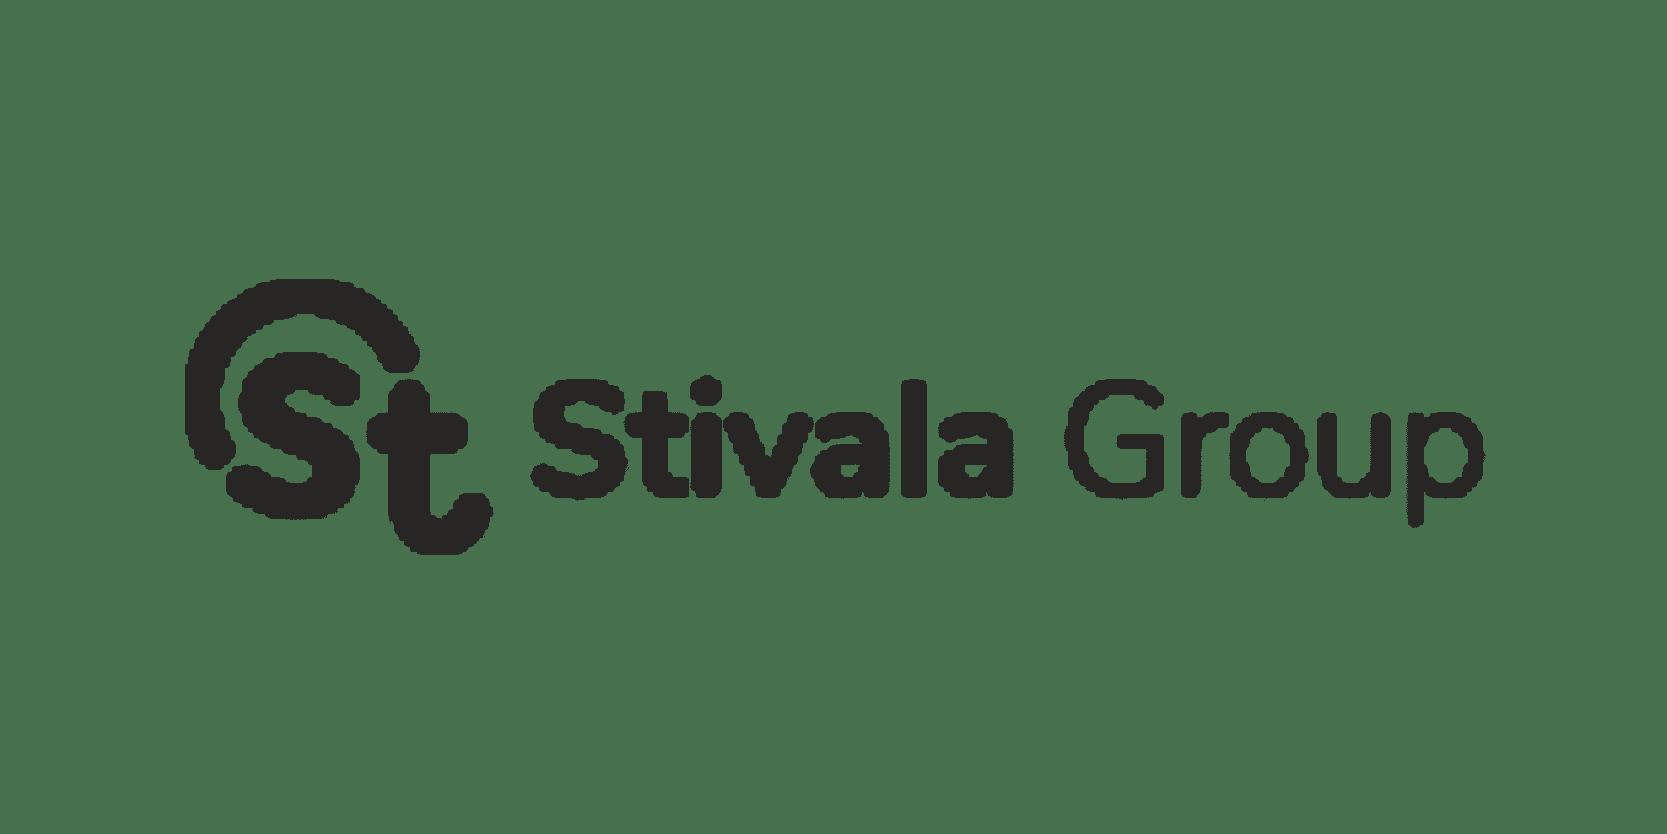 Stivala Group